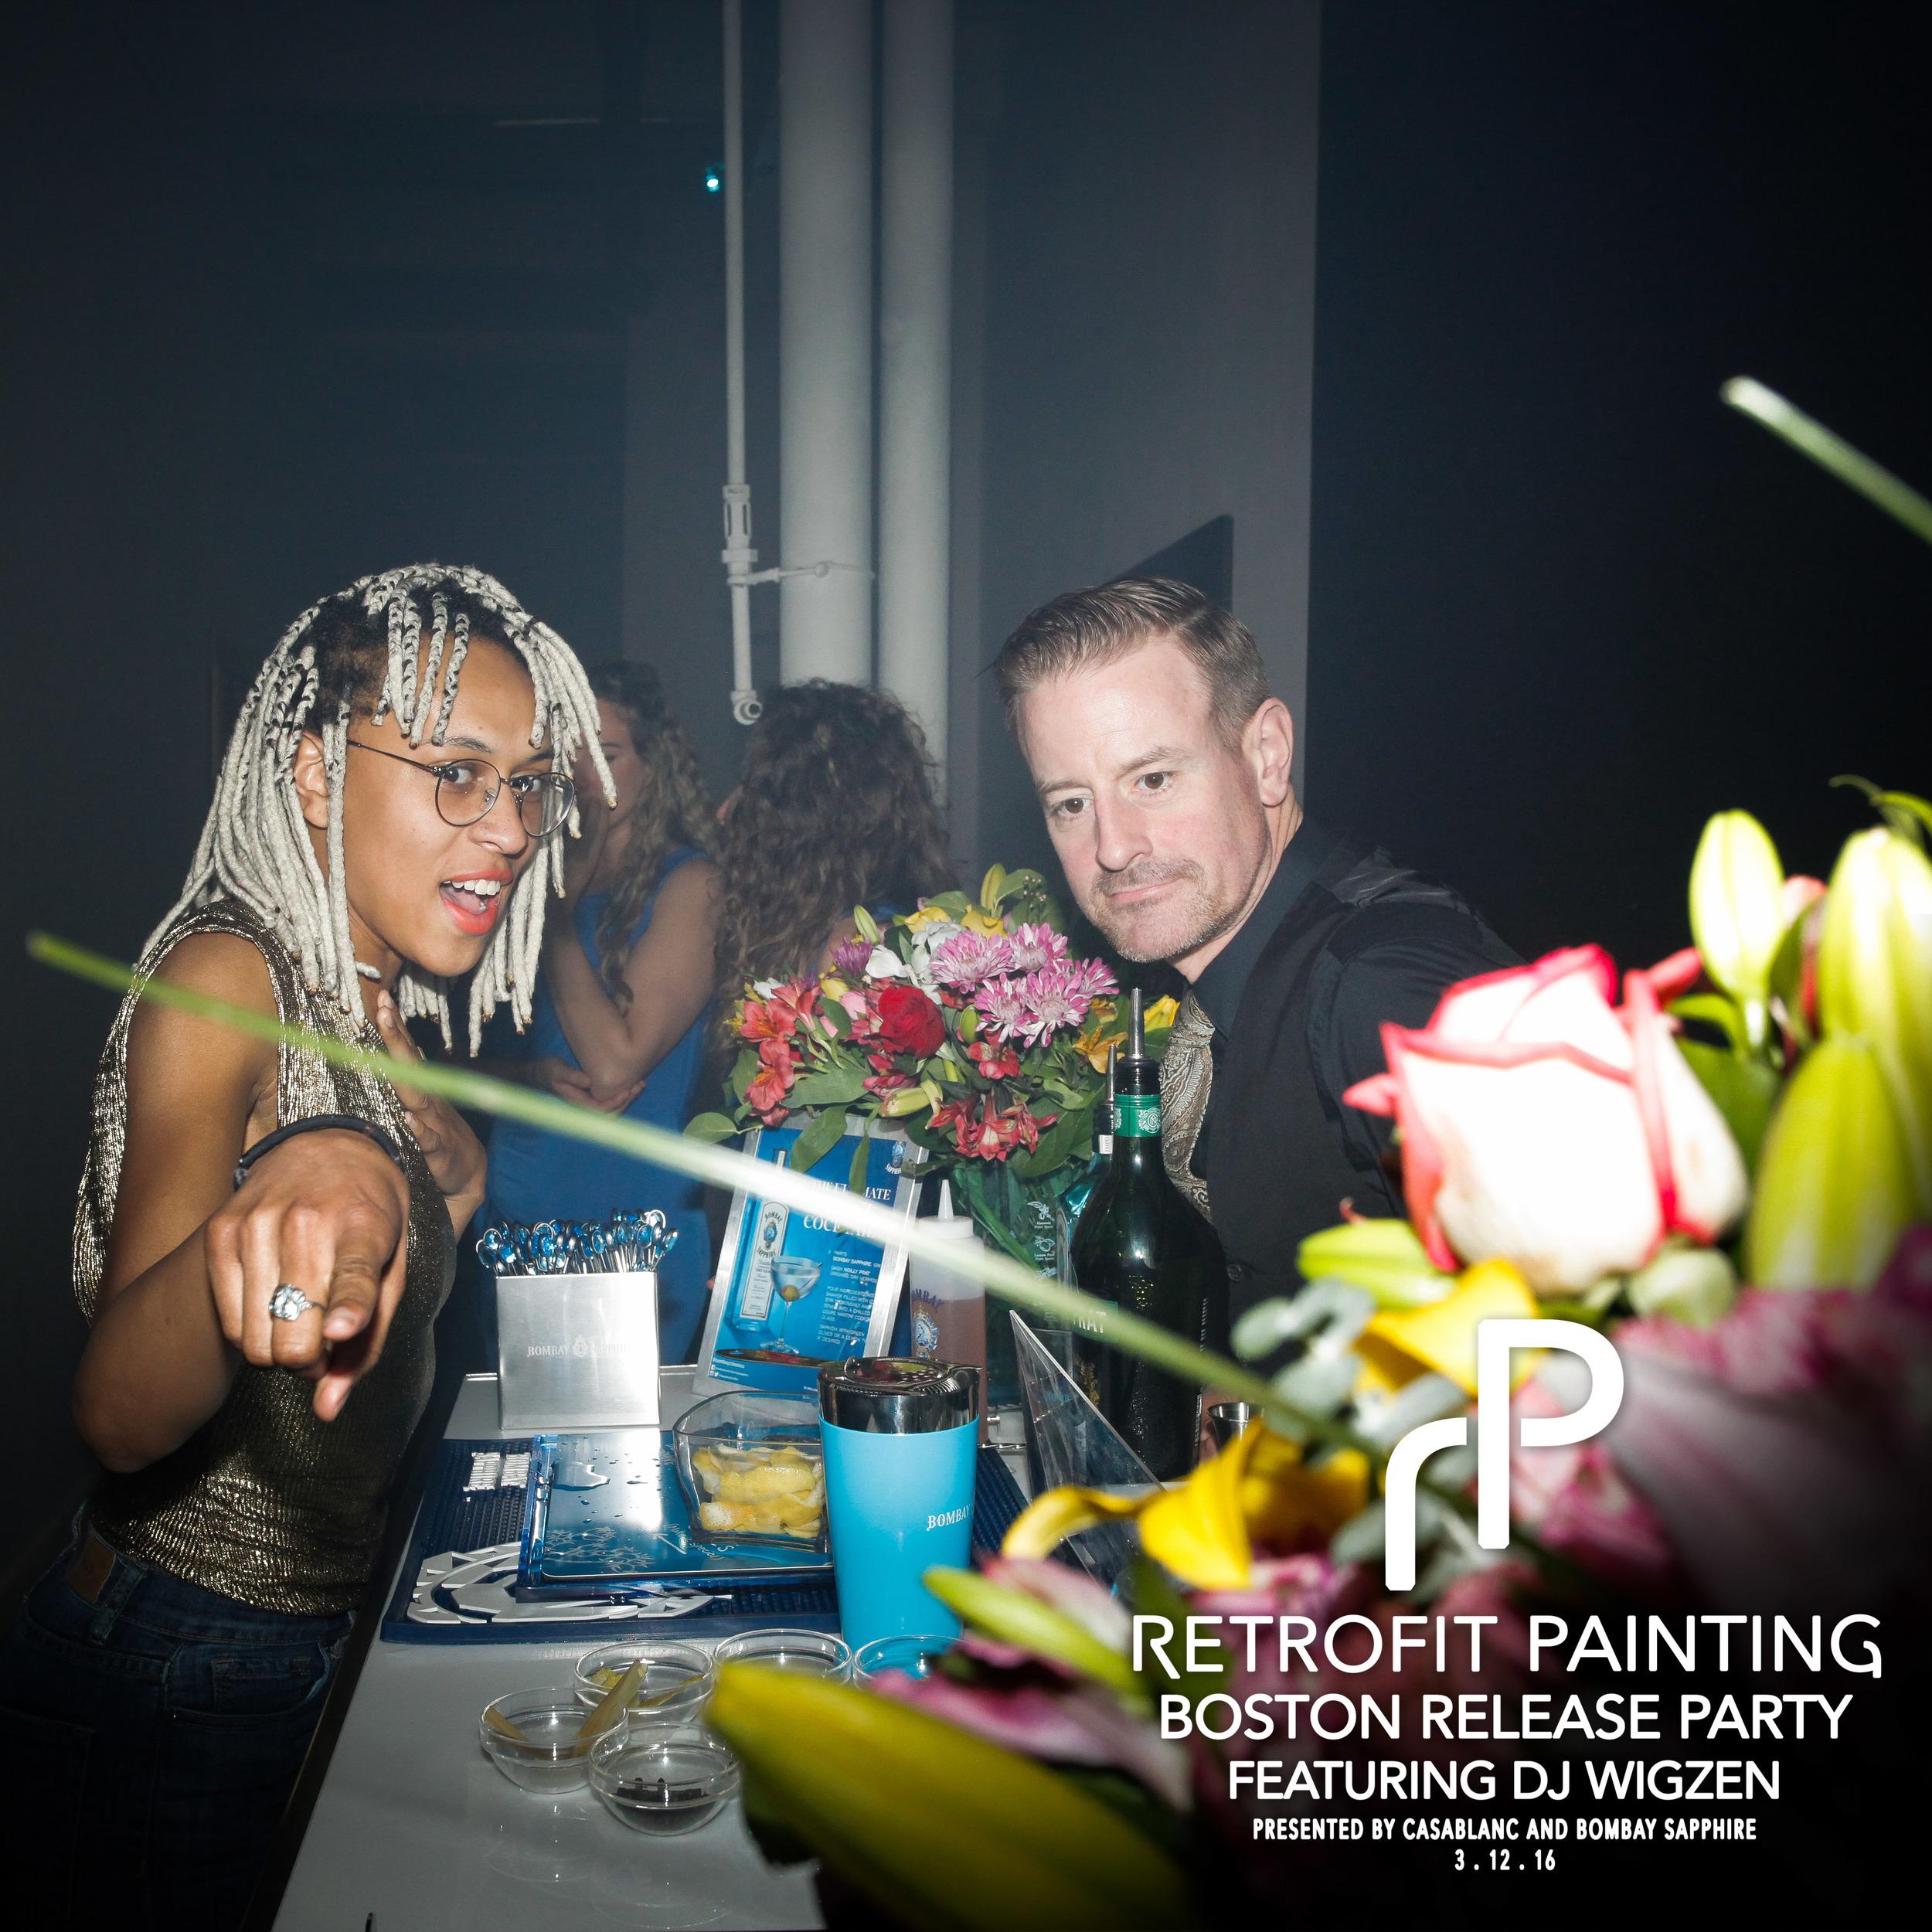 Retrofit Painting Boston Release Party 0070.jpg